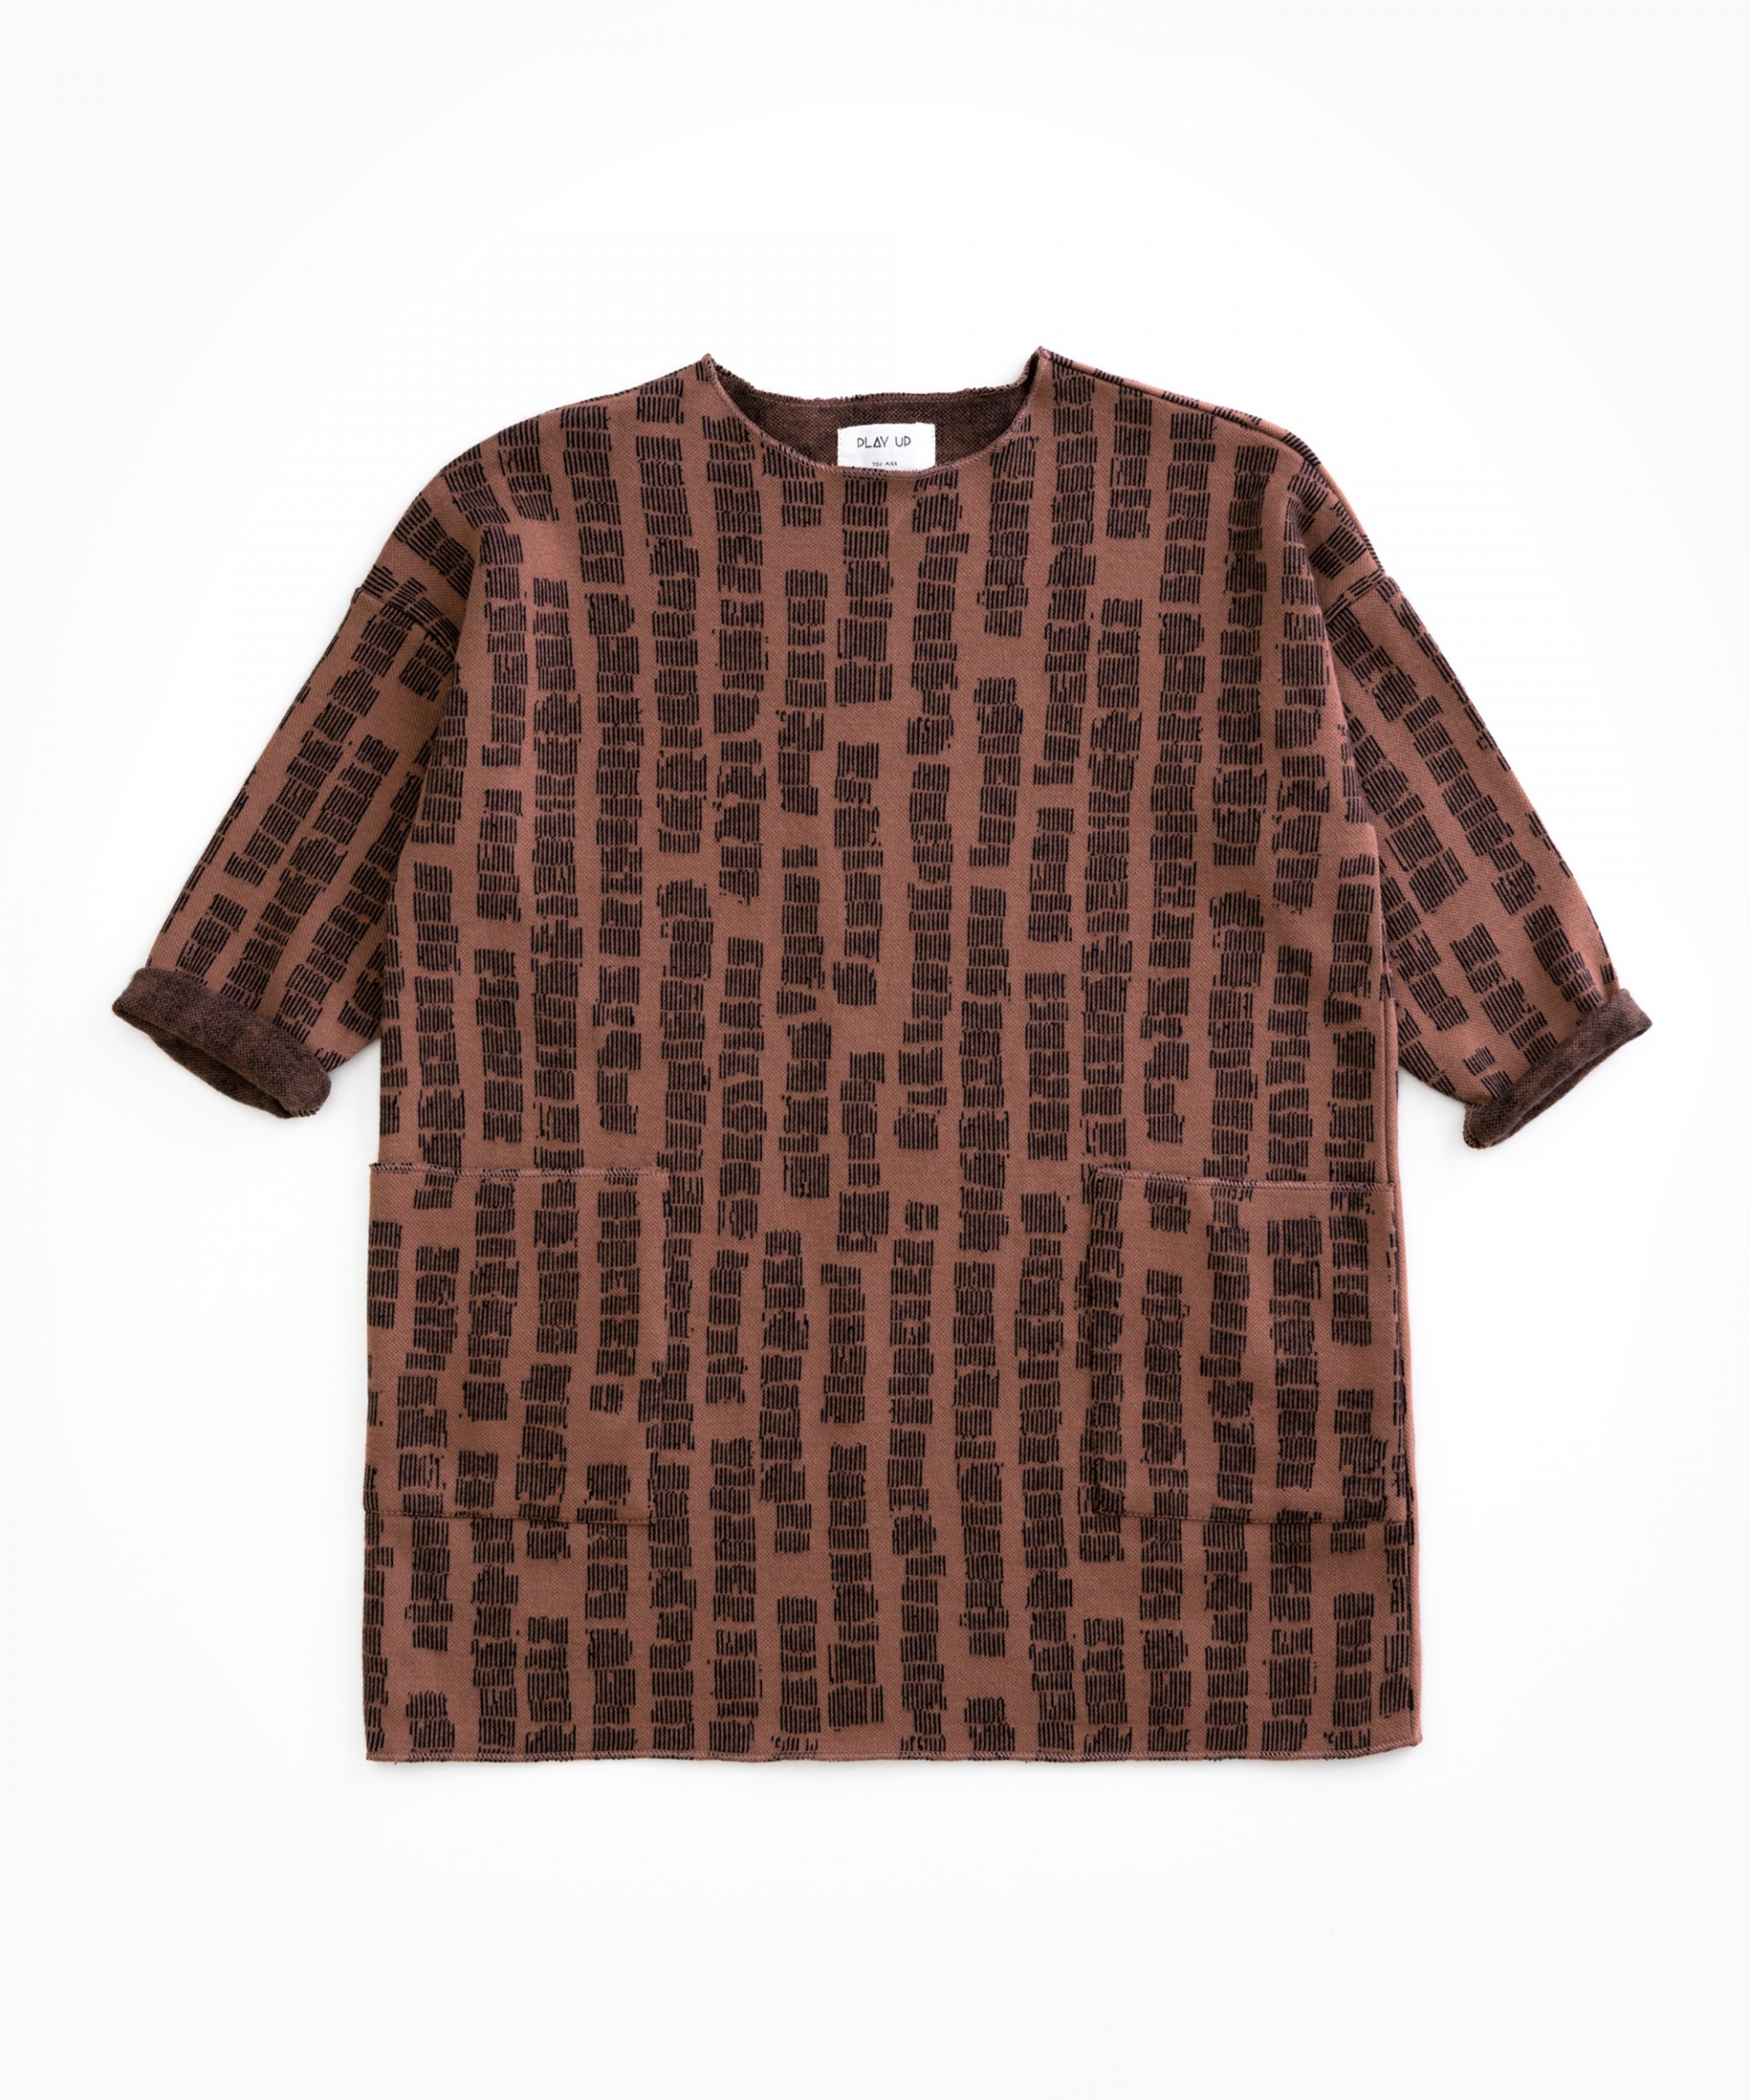 Vestido com bolsos | Woodwork